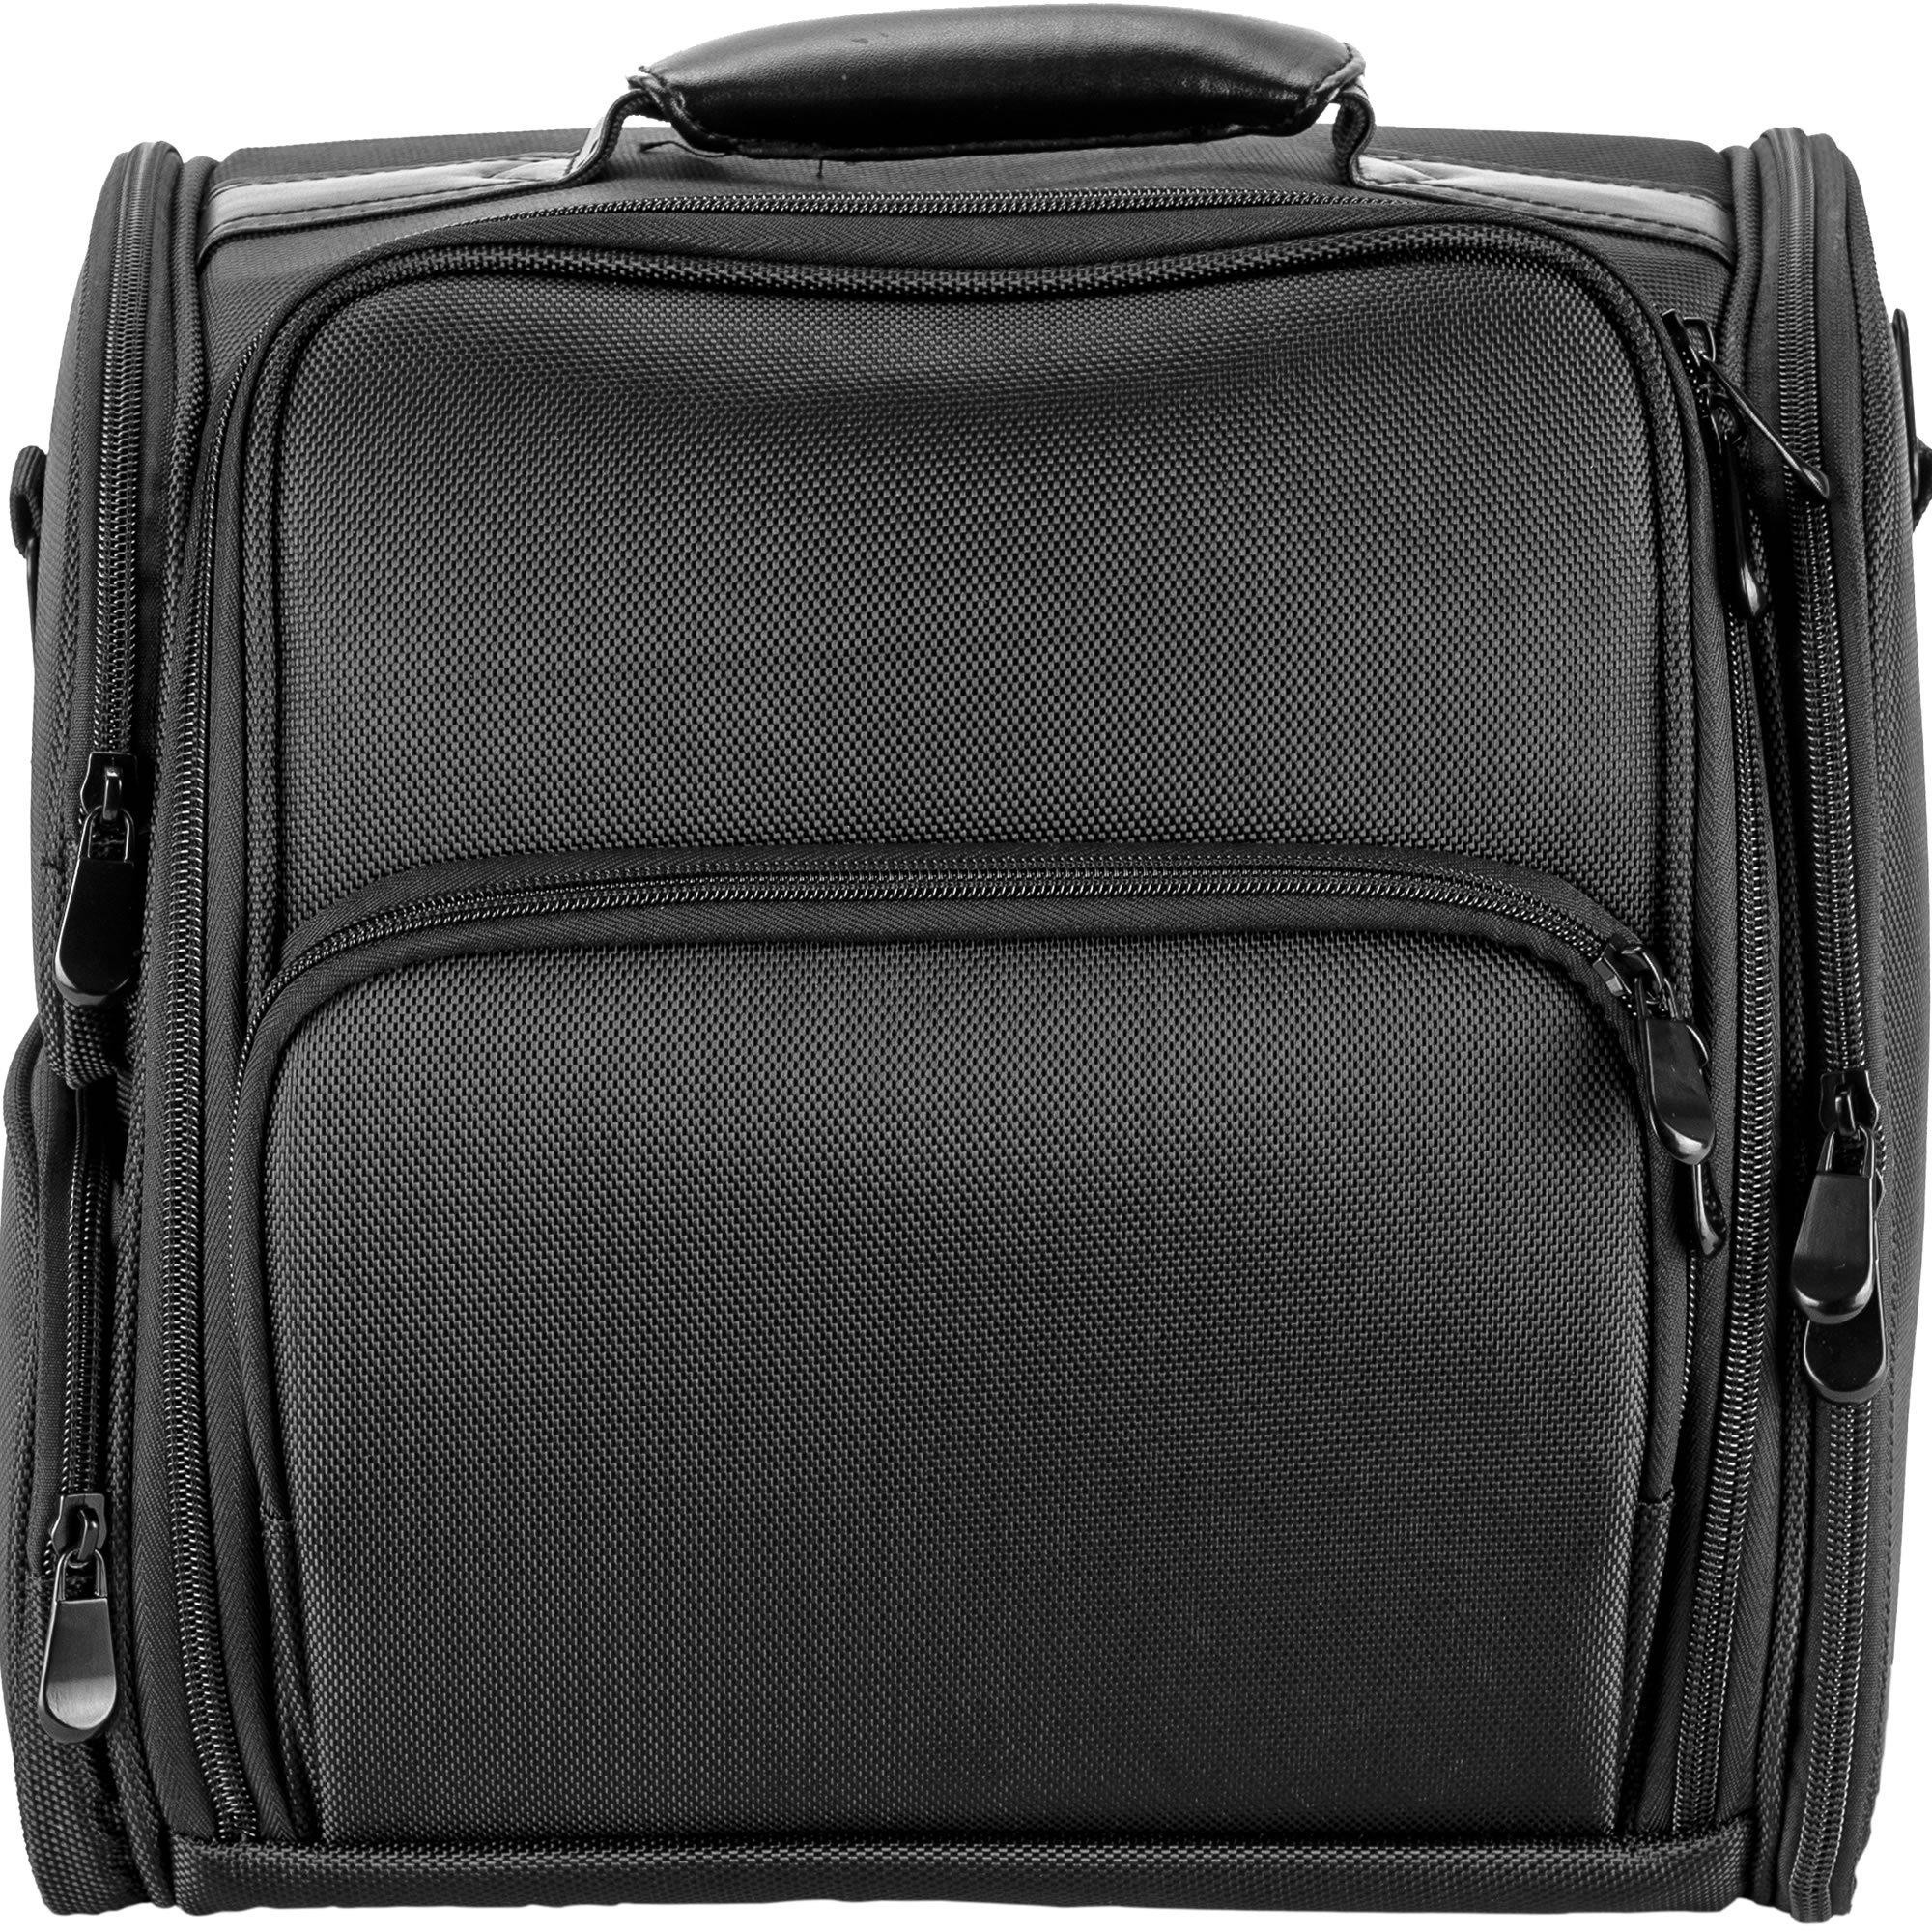 Hiker Hk3603 Soft Sided Professional Travel Makeup Case, Nylon Black